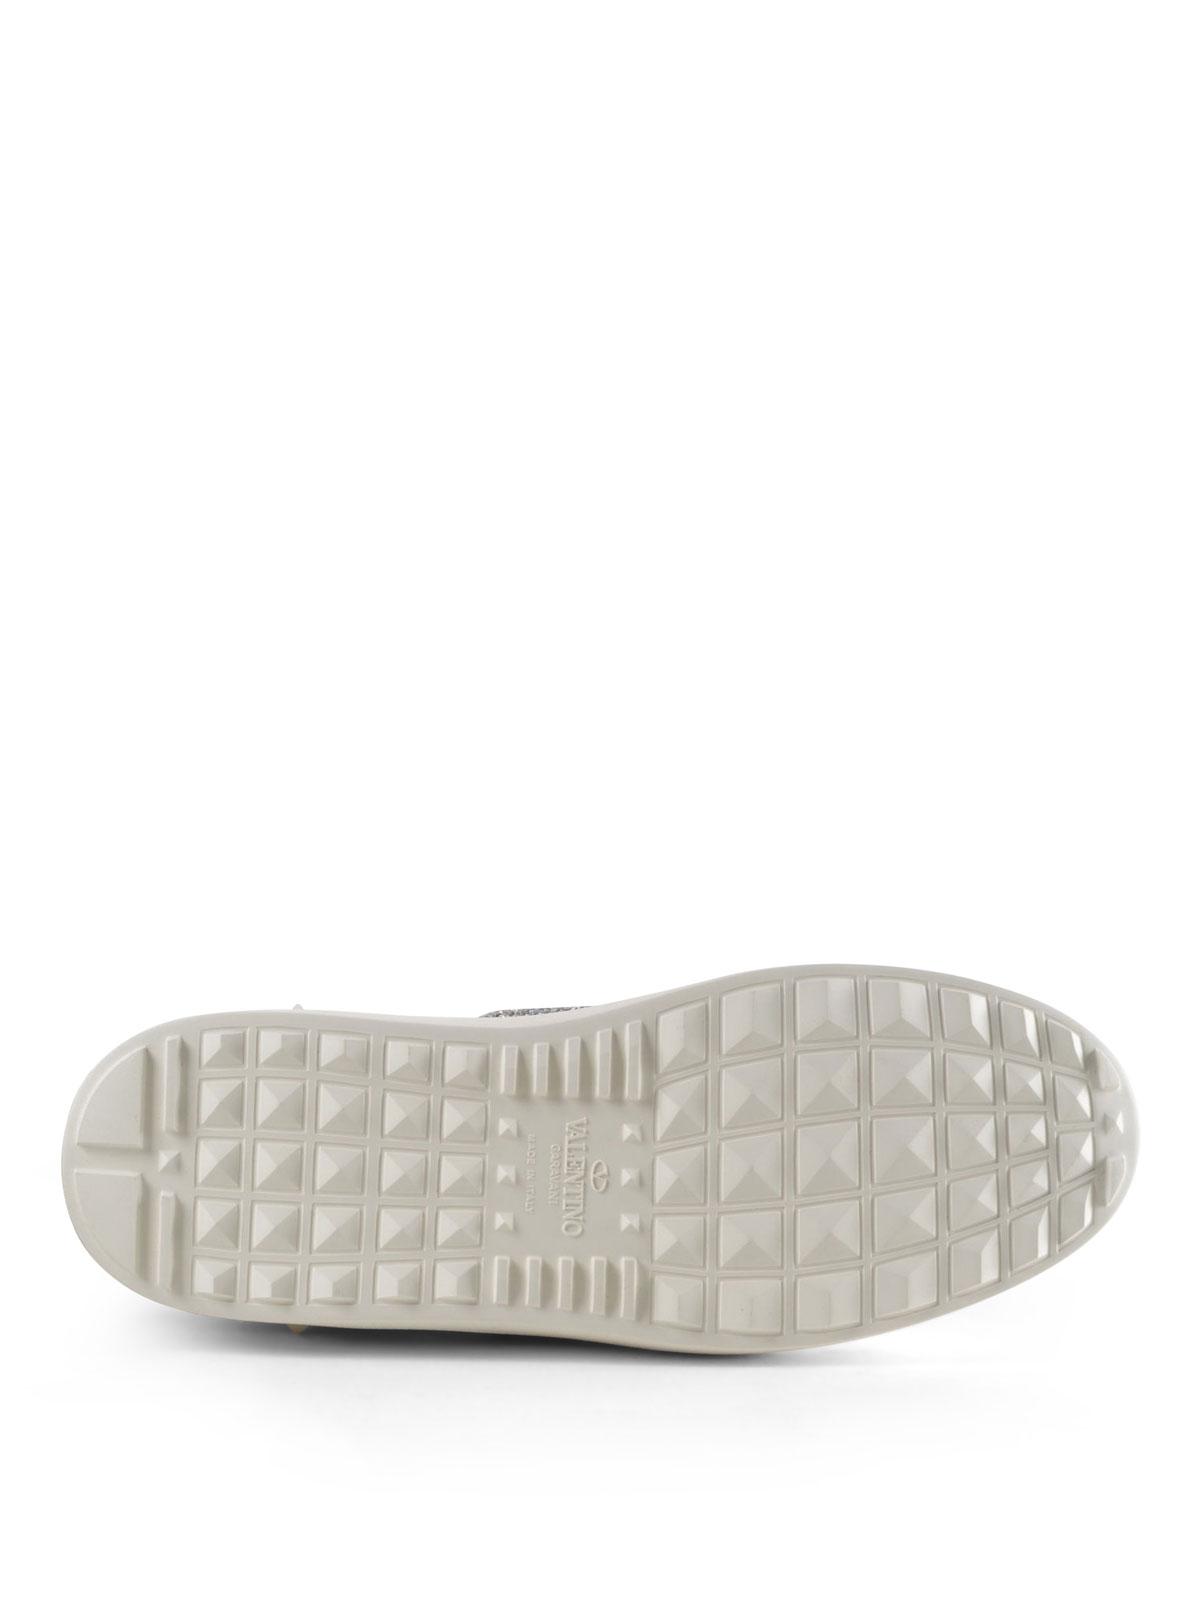 VALENTINO GARAVANI buy online Sneaker Open con banda glitter argento 75591600664